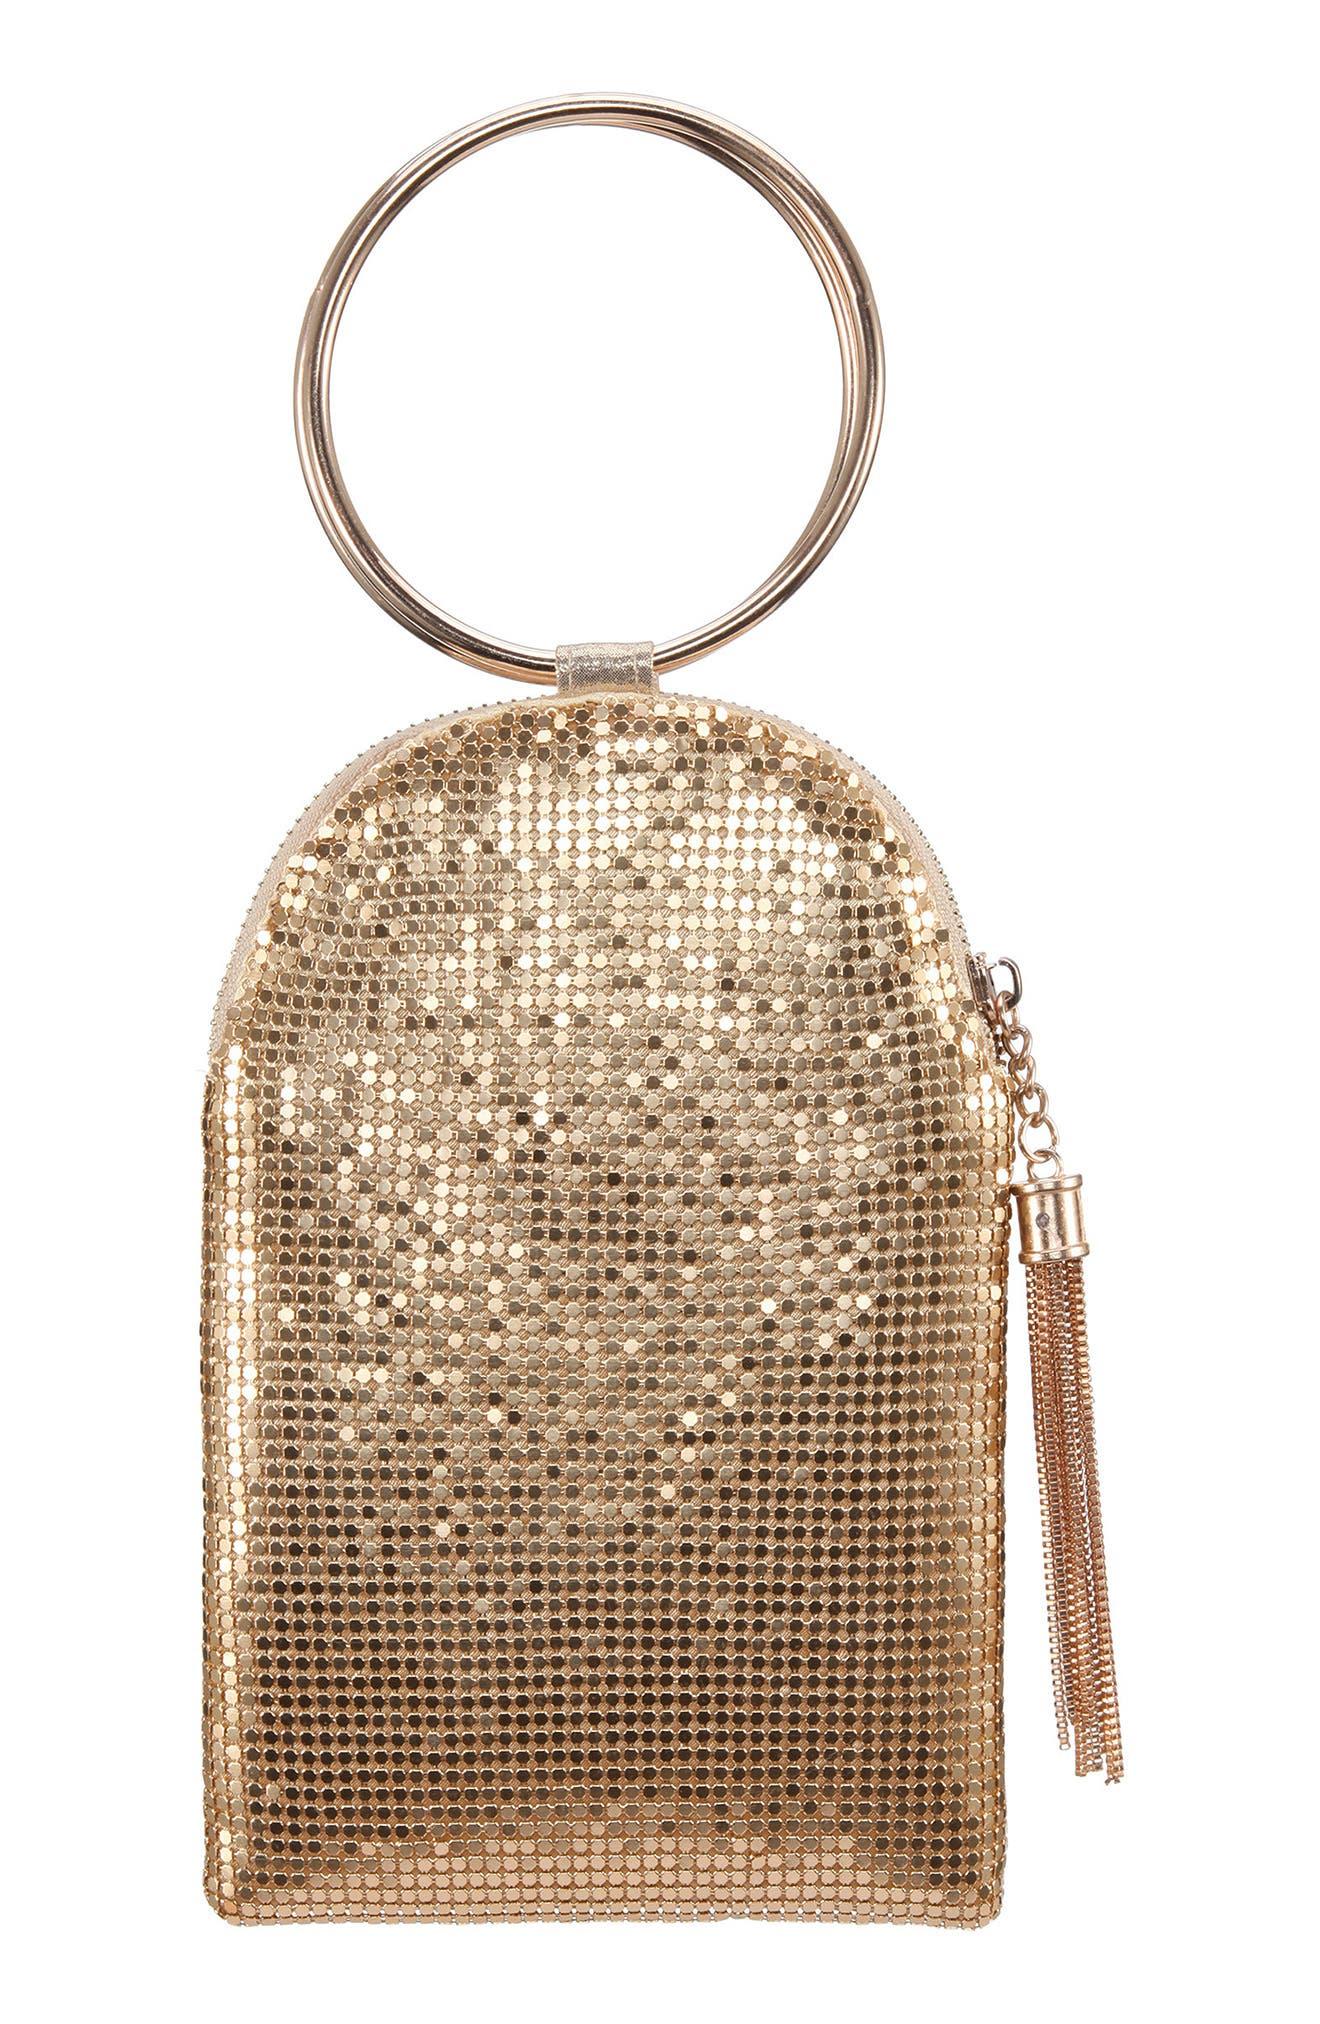 Metallic Mesh Handbag - Metallic, Gold